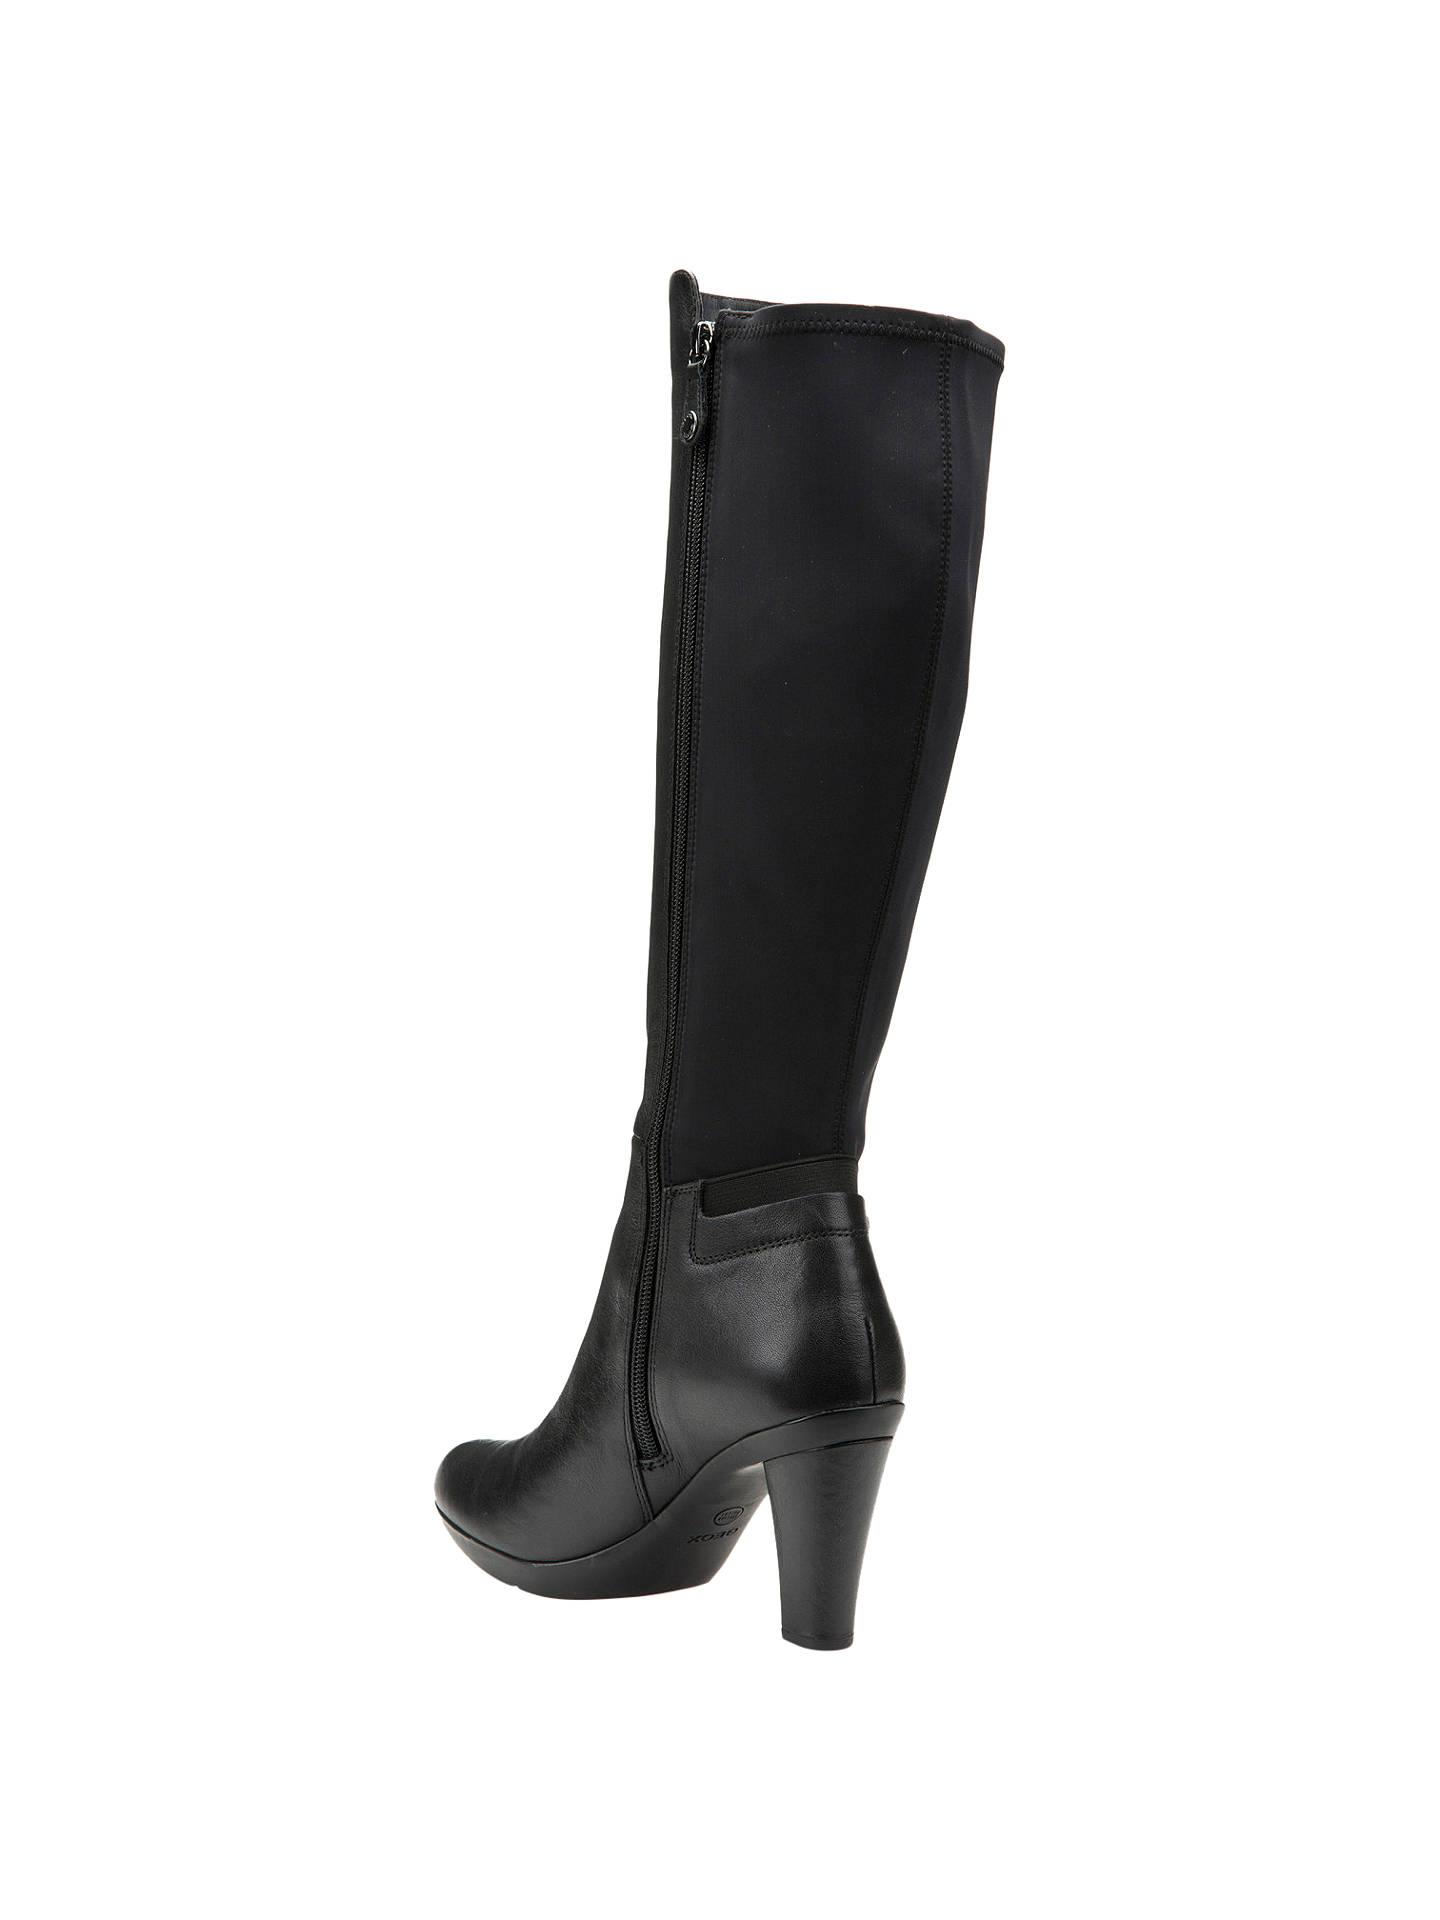 6b2ea1b3857 ... Buy Geox Inspiration Block Heeled Knee High Boots